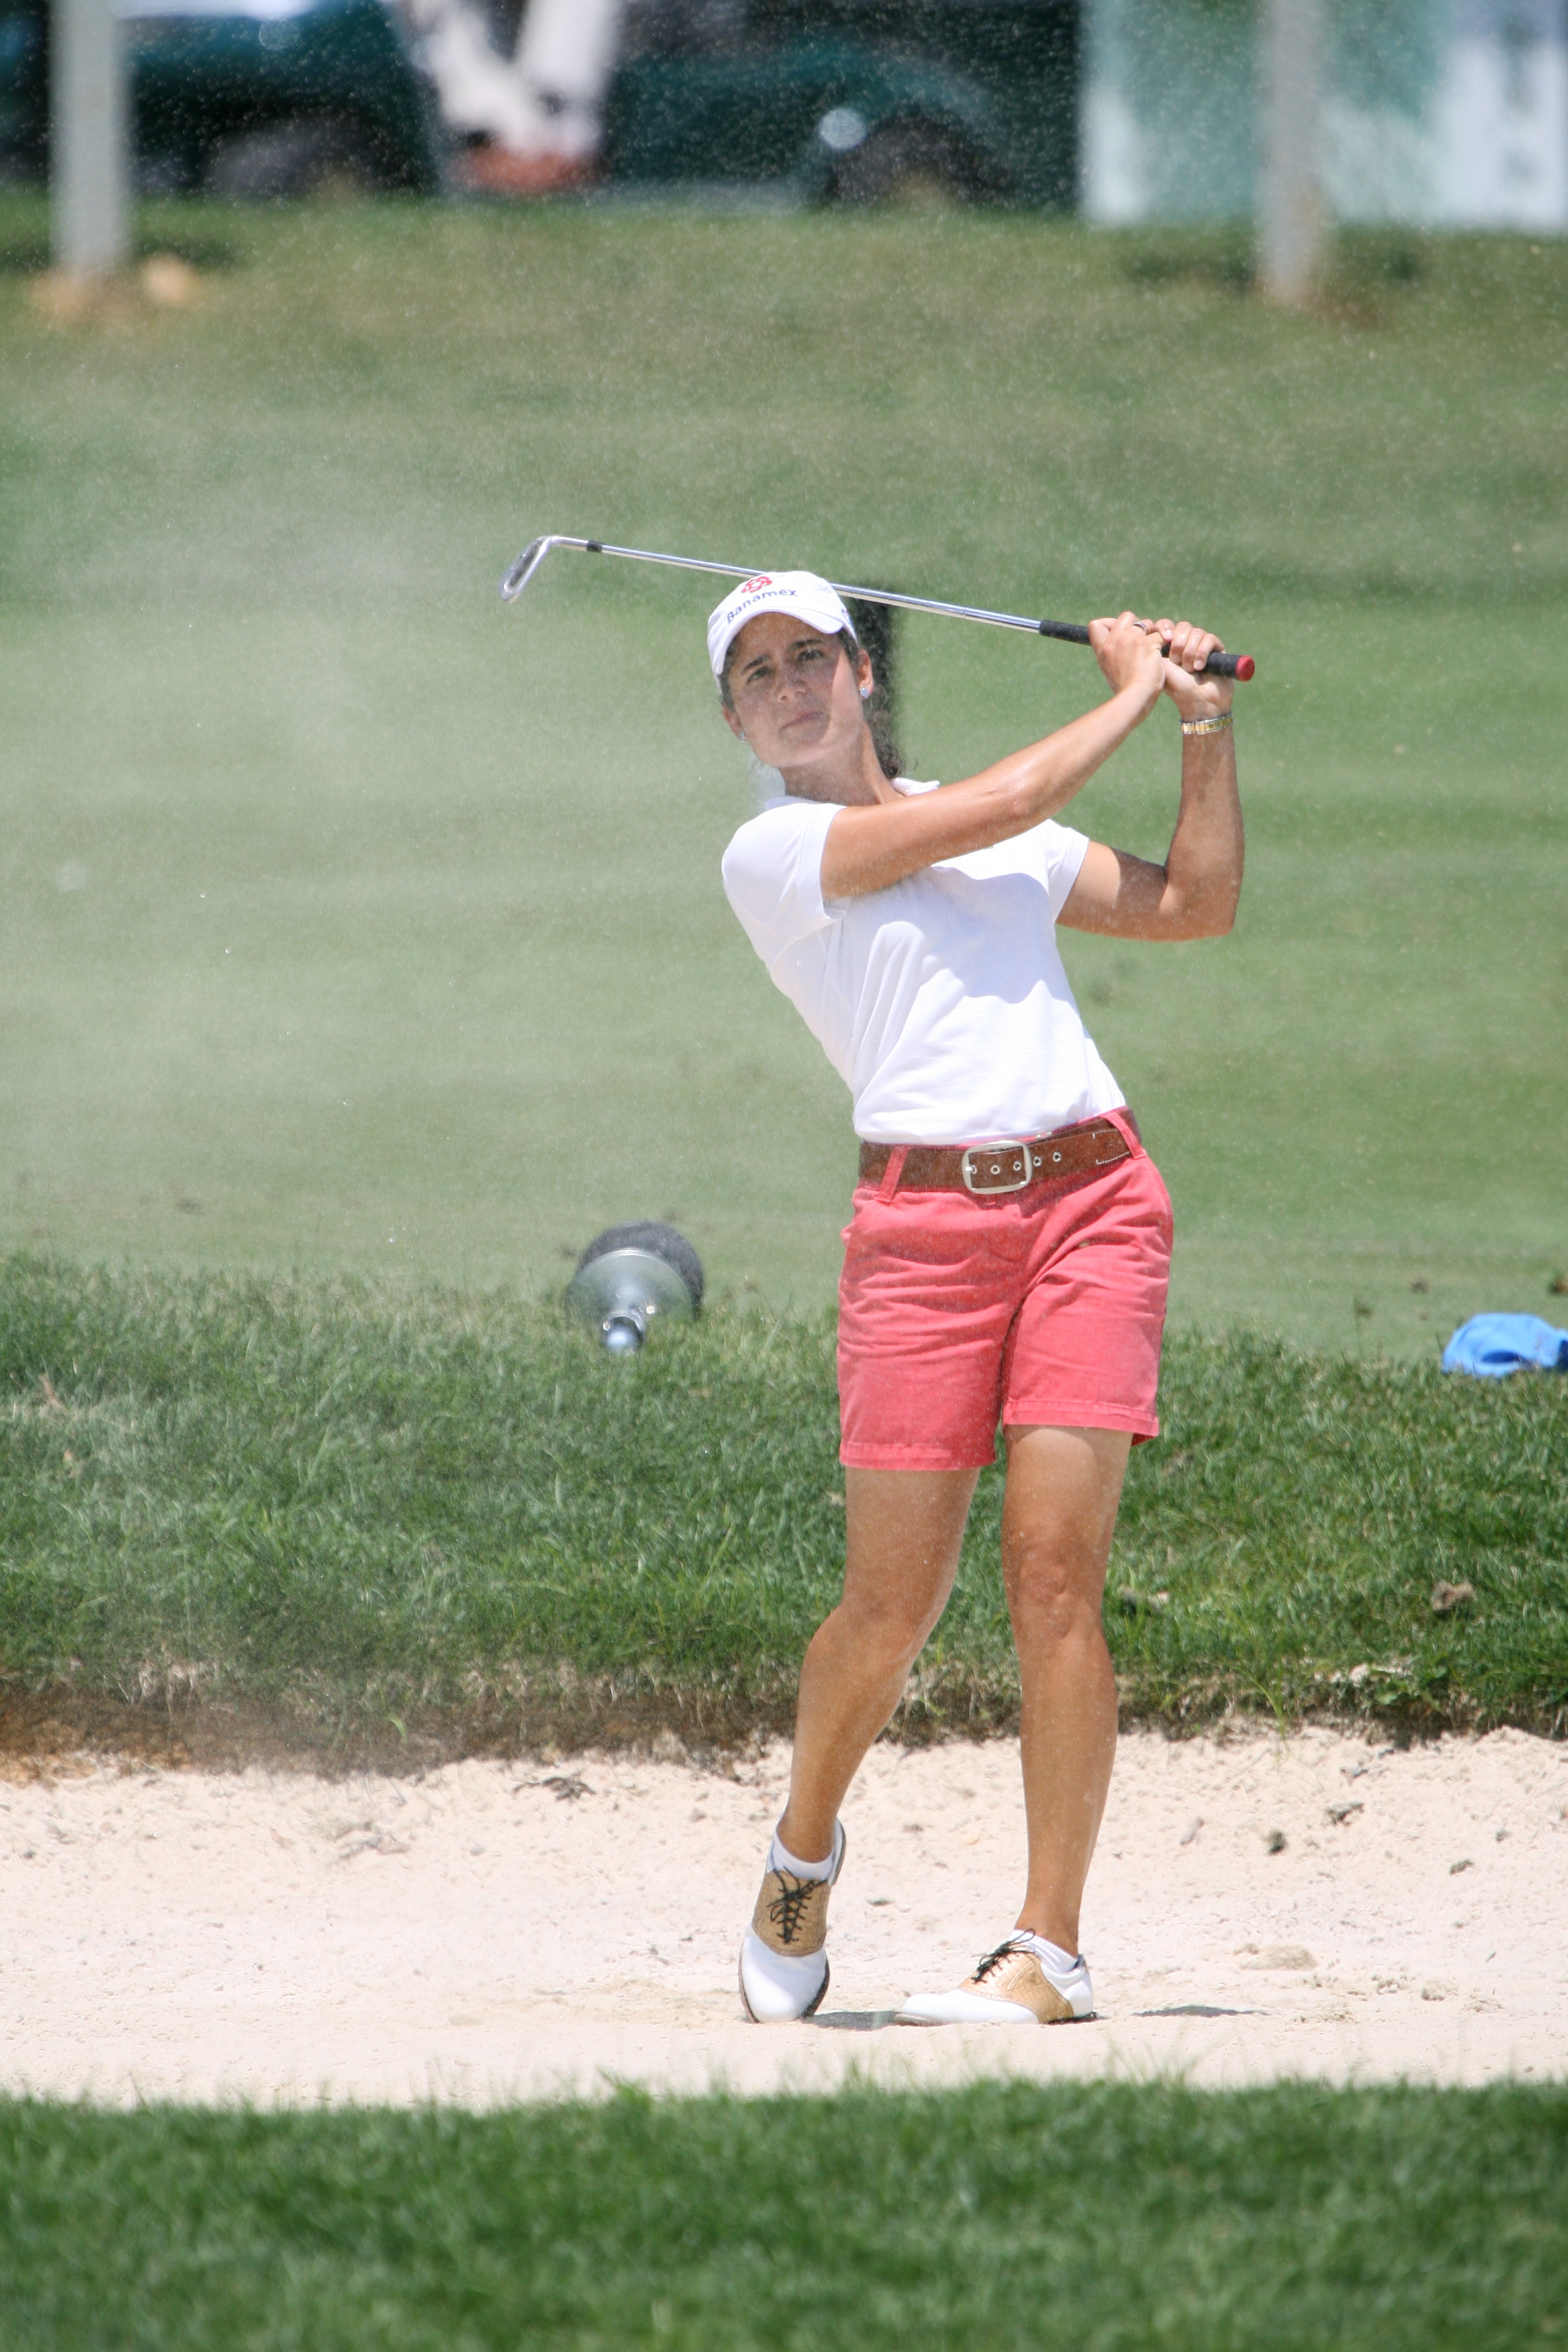 Lorena Ochoa - Golfer - Wardrobe malfunction